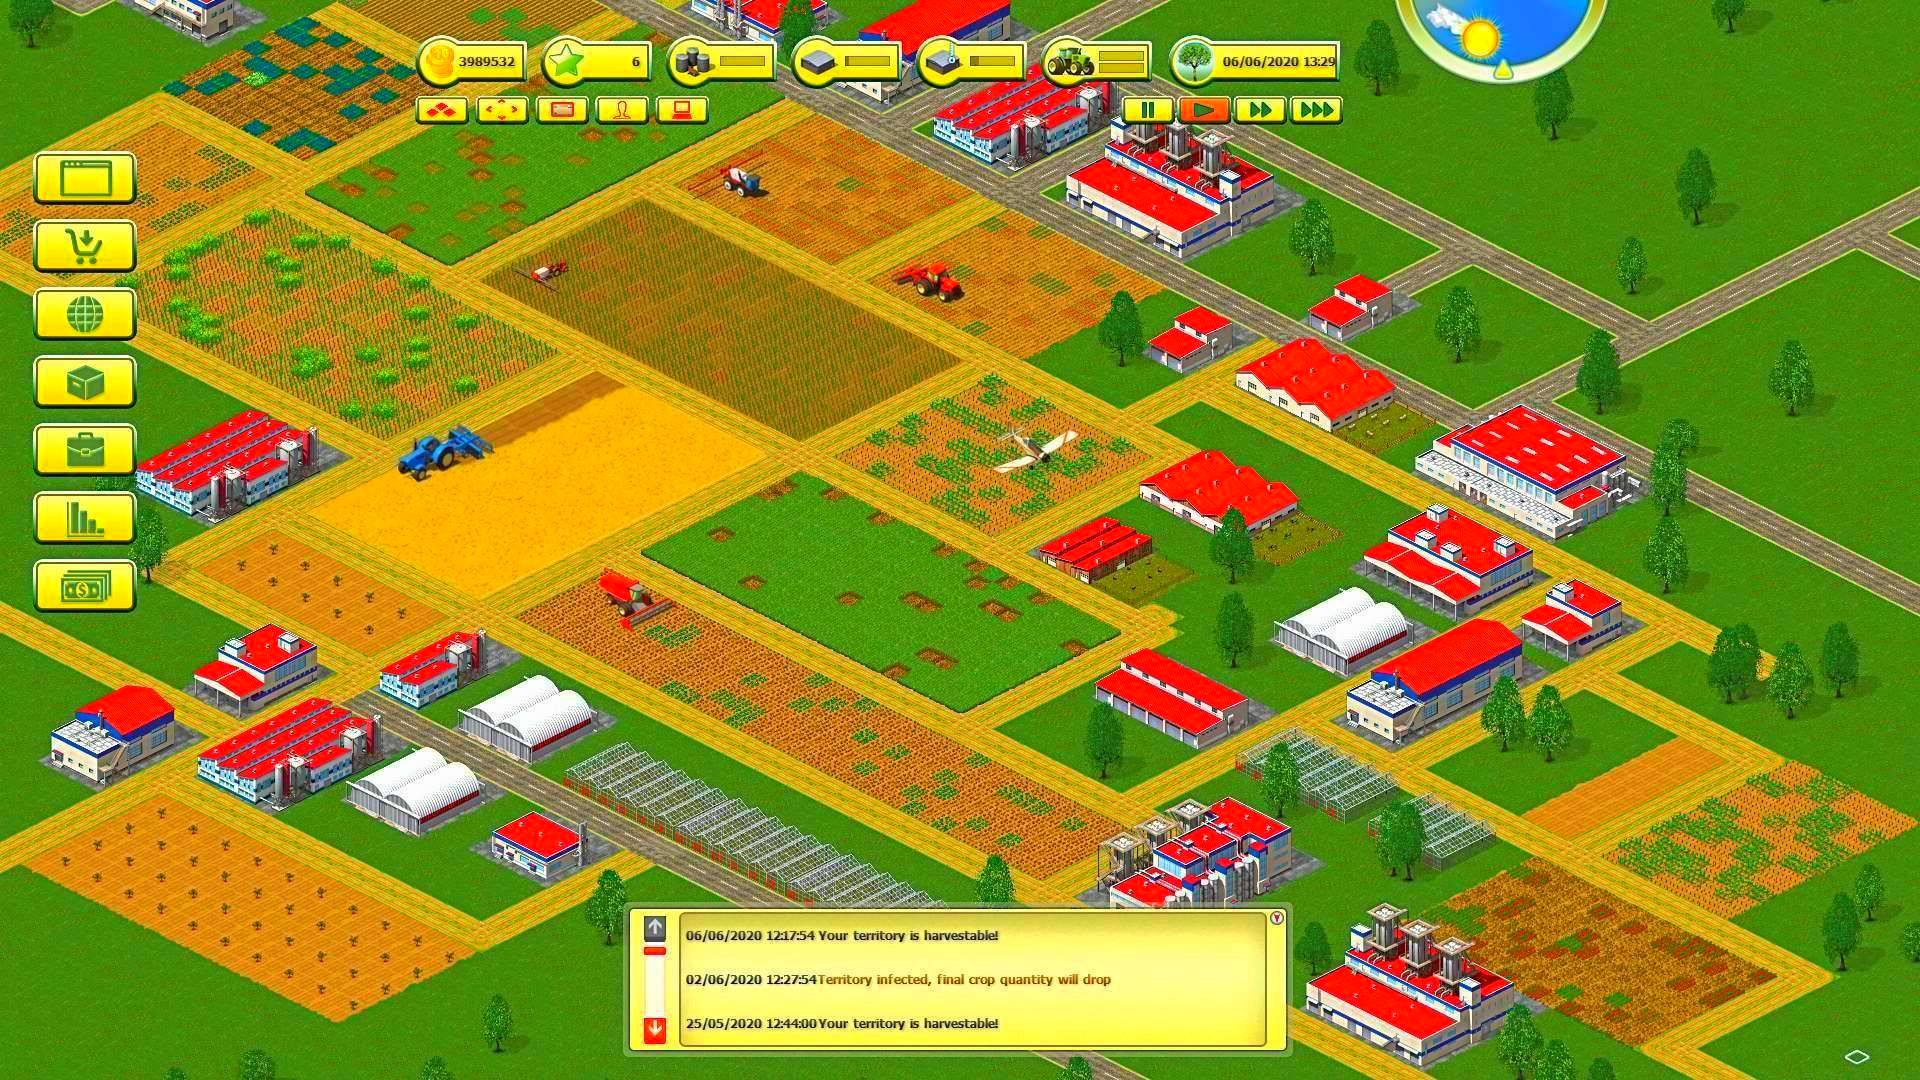 Screenshot from Farming World (3/6)